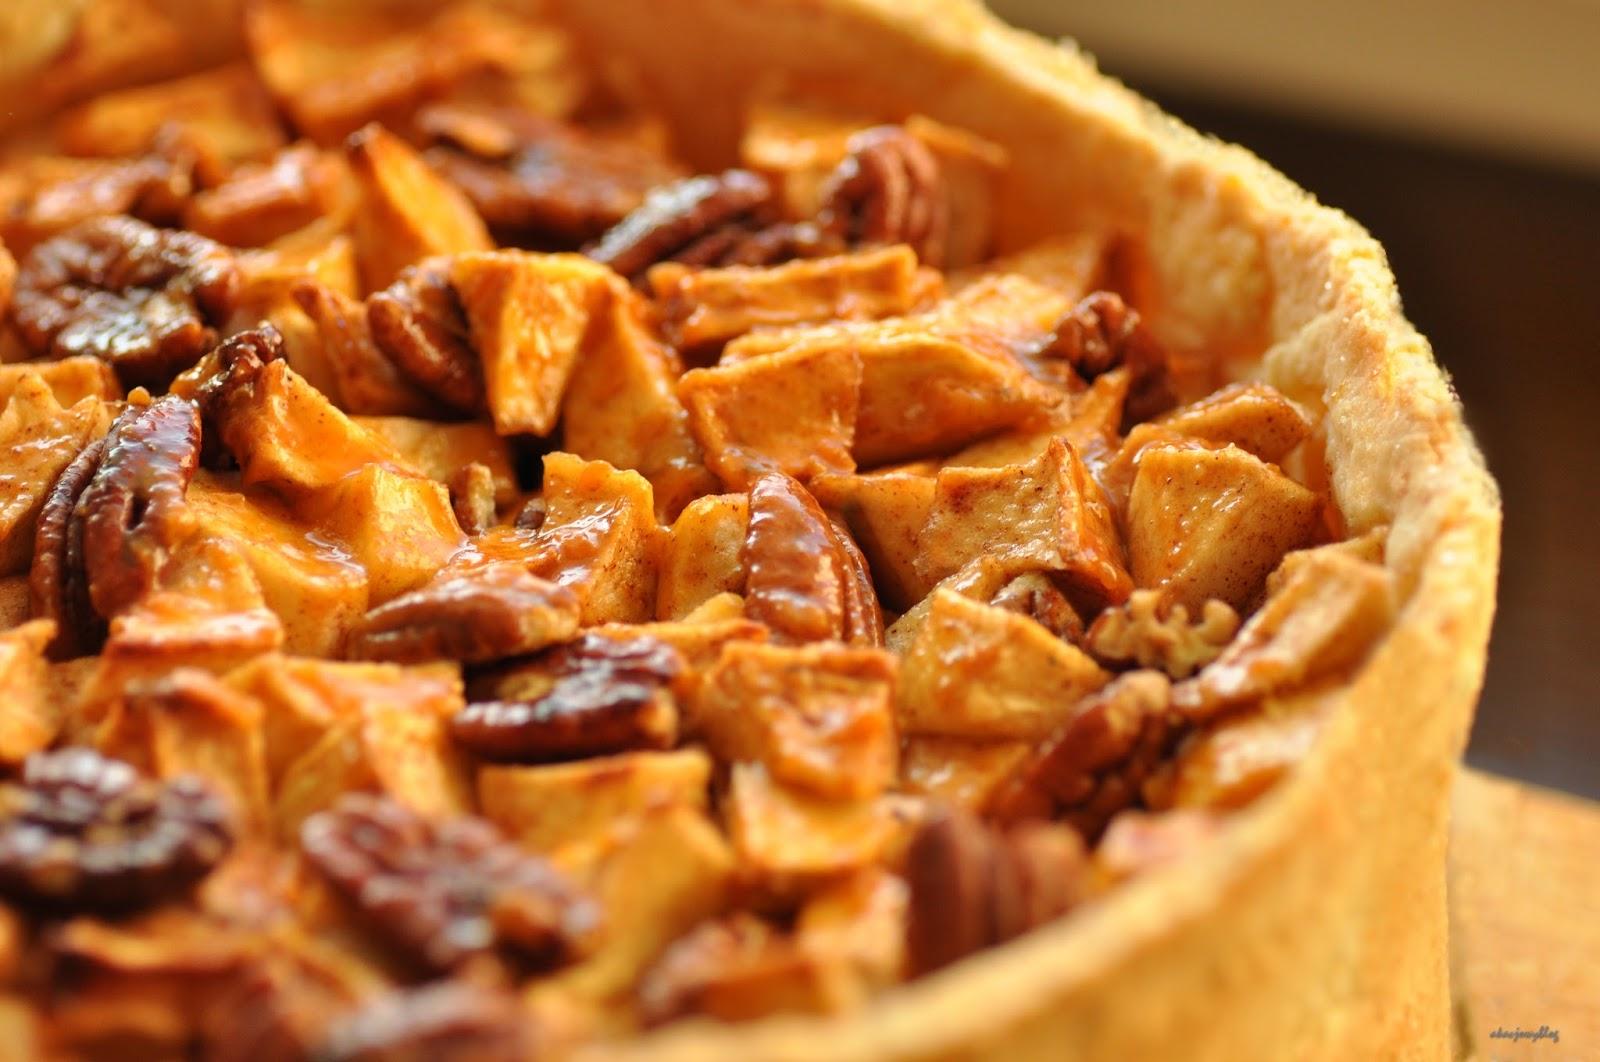 Kruche ciasto jabłkowo - pekanowe.